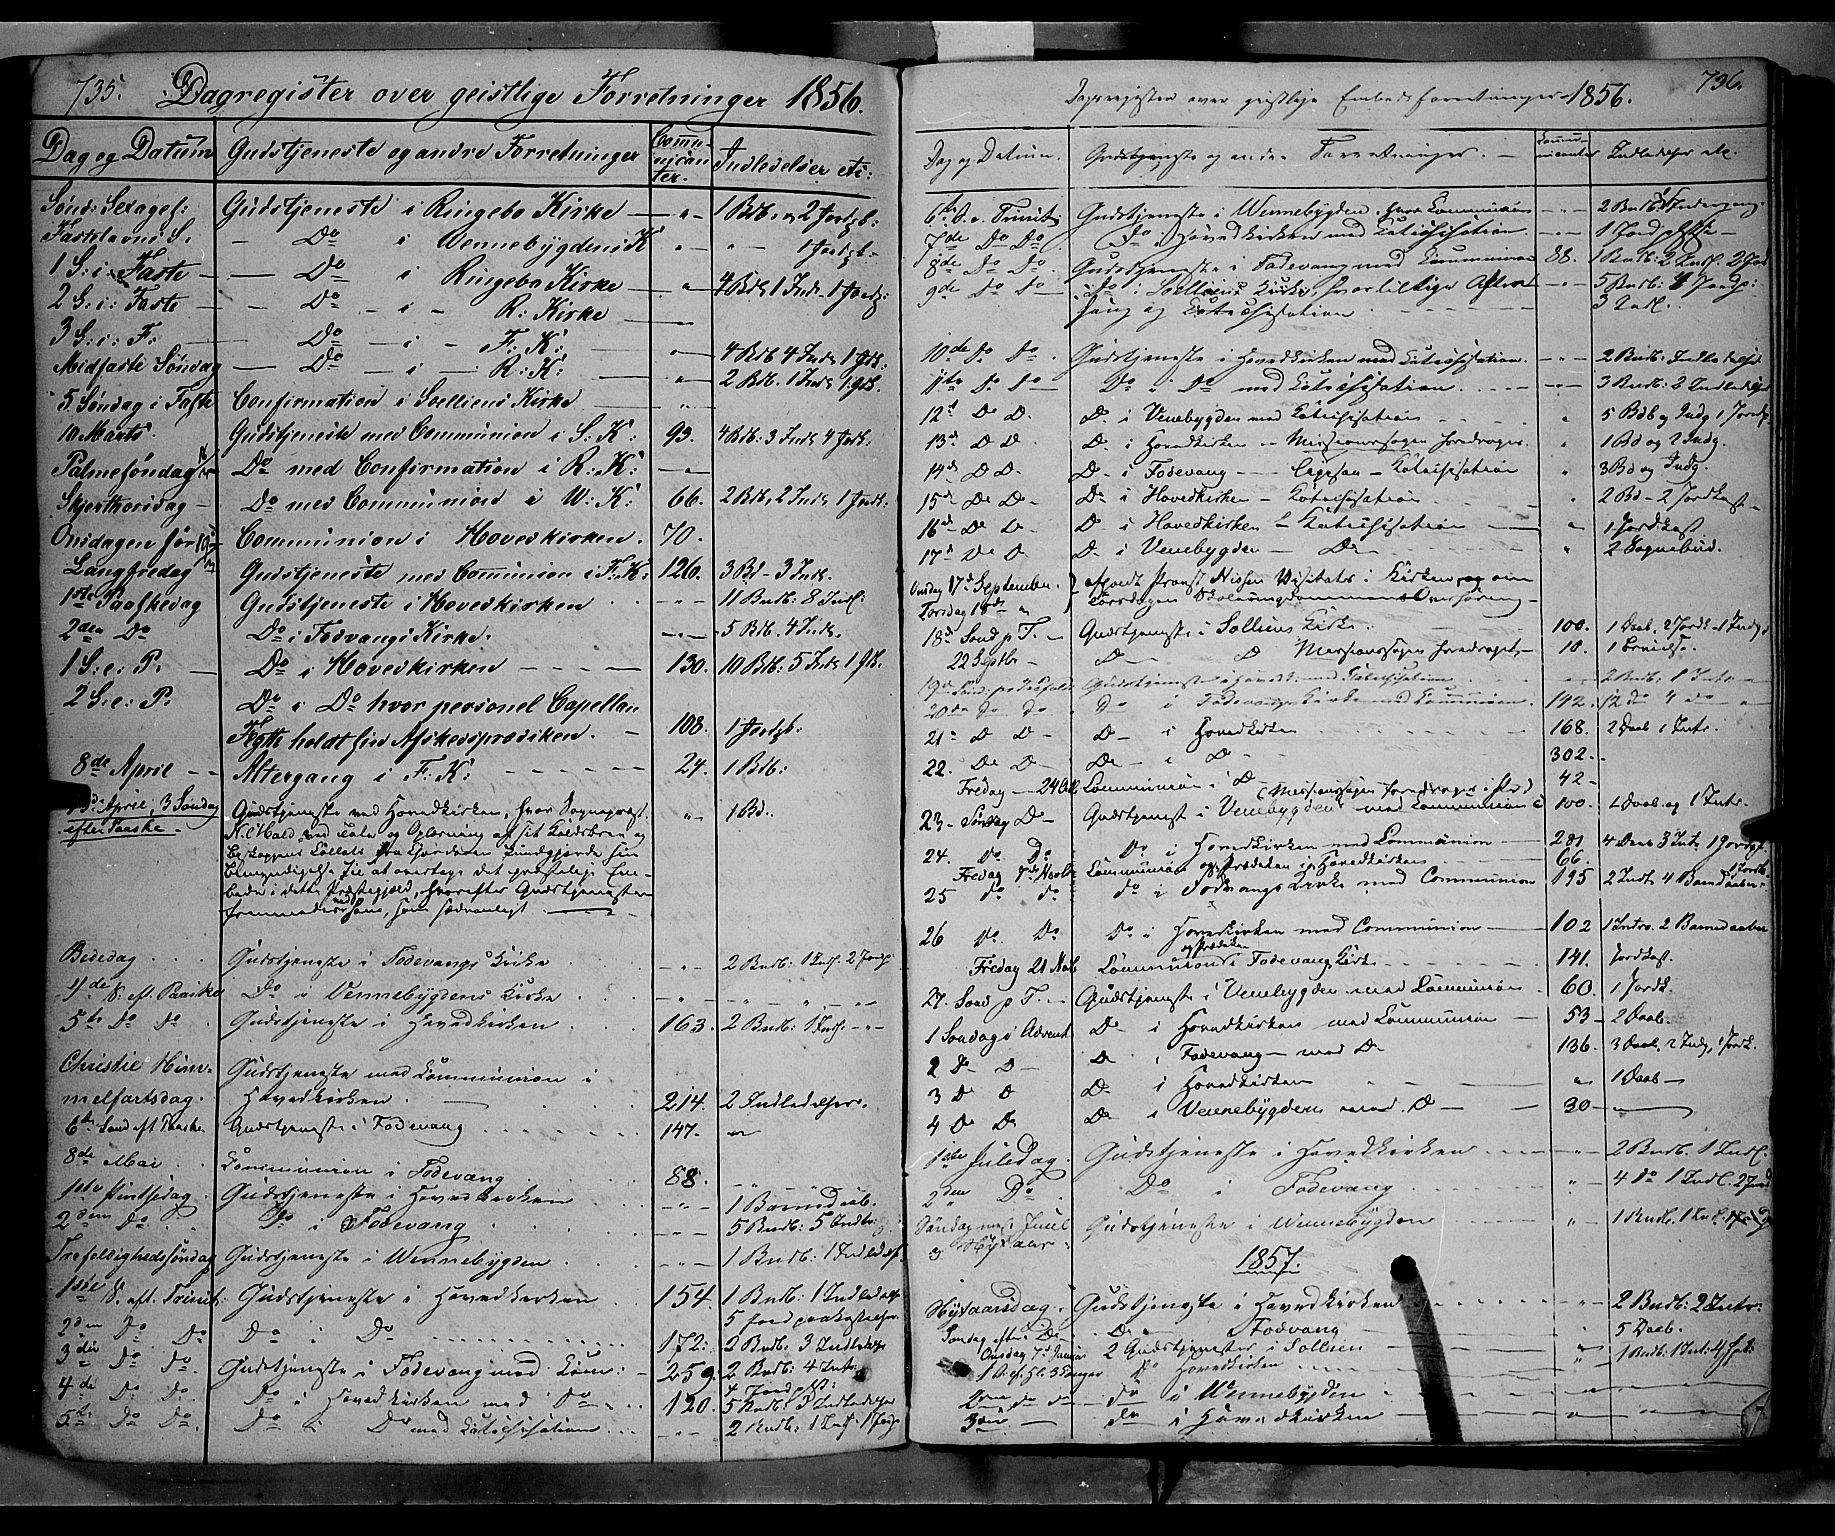 SAH, Ringebu prestekontor, Ministerialbok nr. 6, 1848-1859, s. 735-736